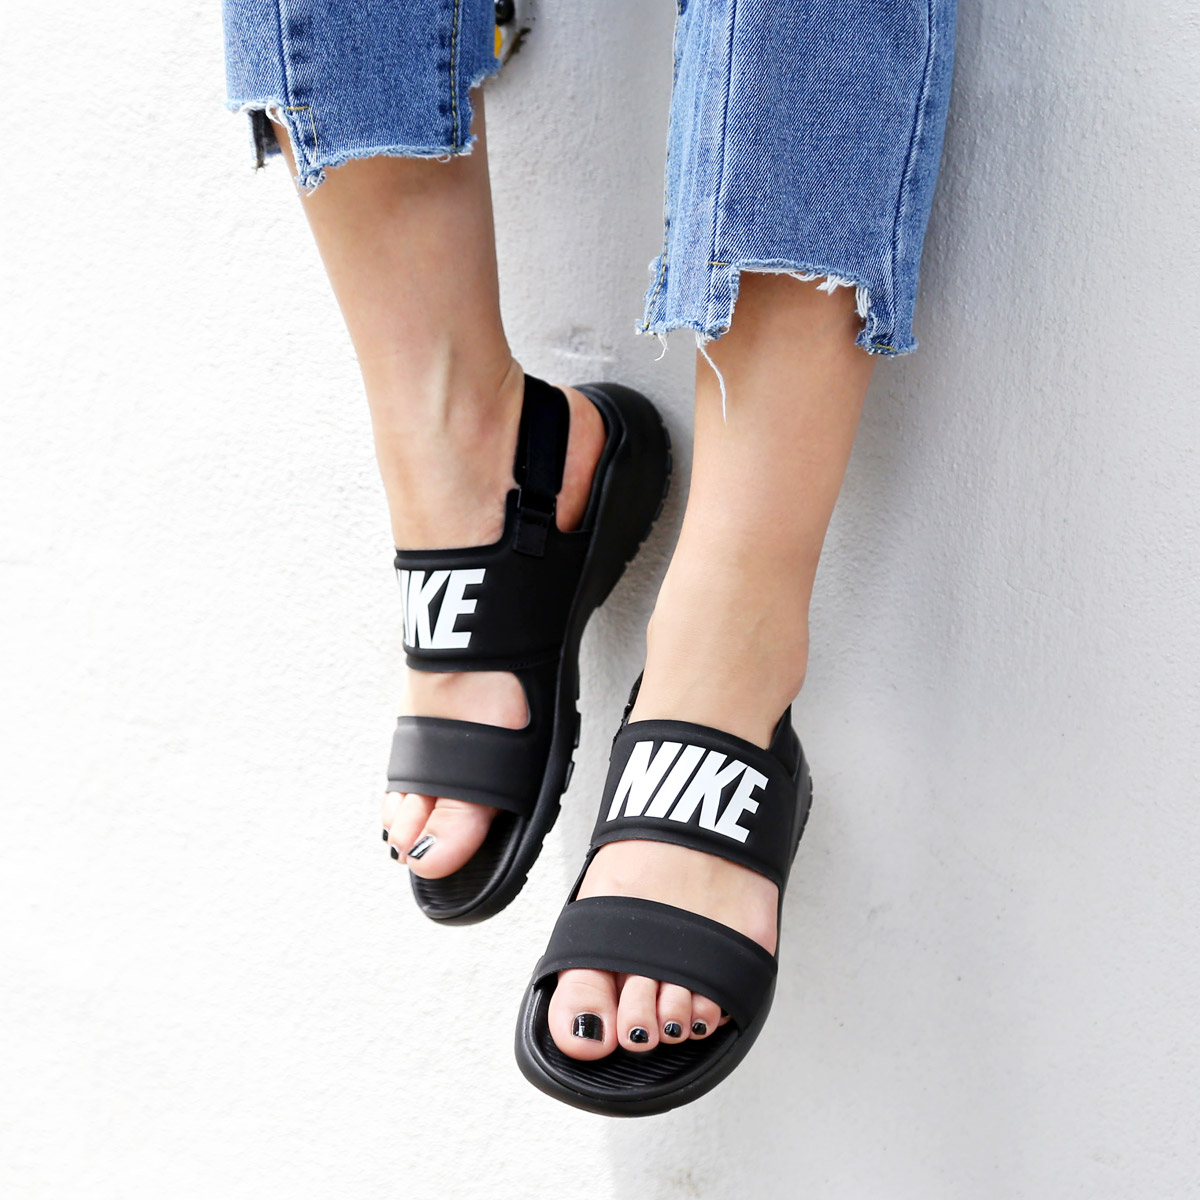 cf7108848ca883 NIKE WMNS TANJUN SANDAL (Nike women tongue Jun sandals) BLACK WHITE-BLACK  17SU-I